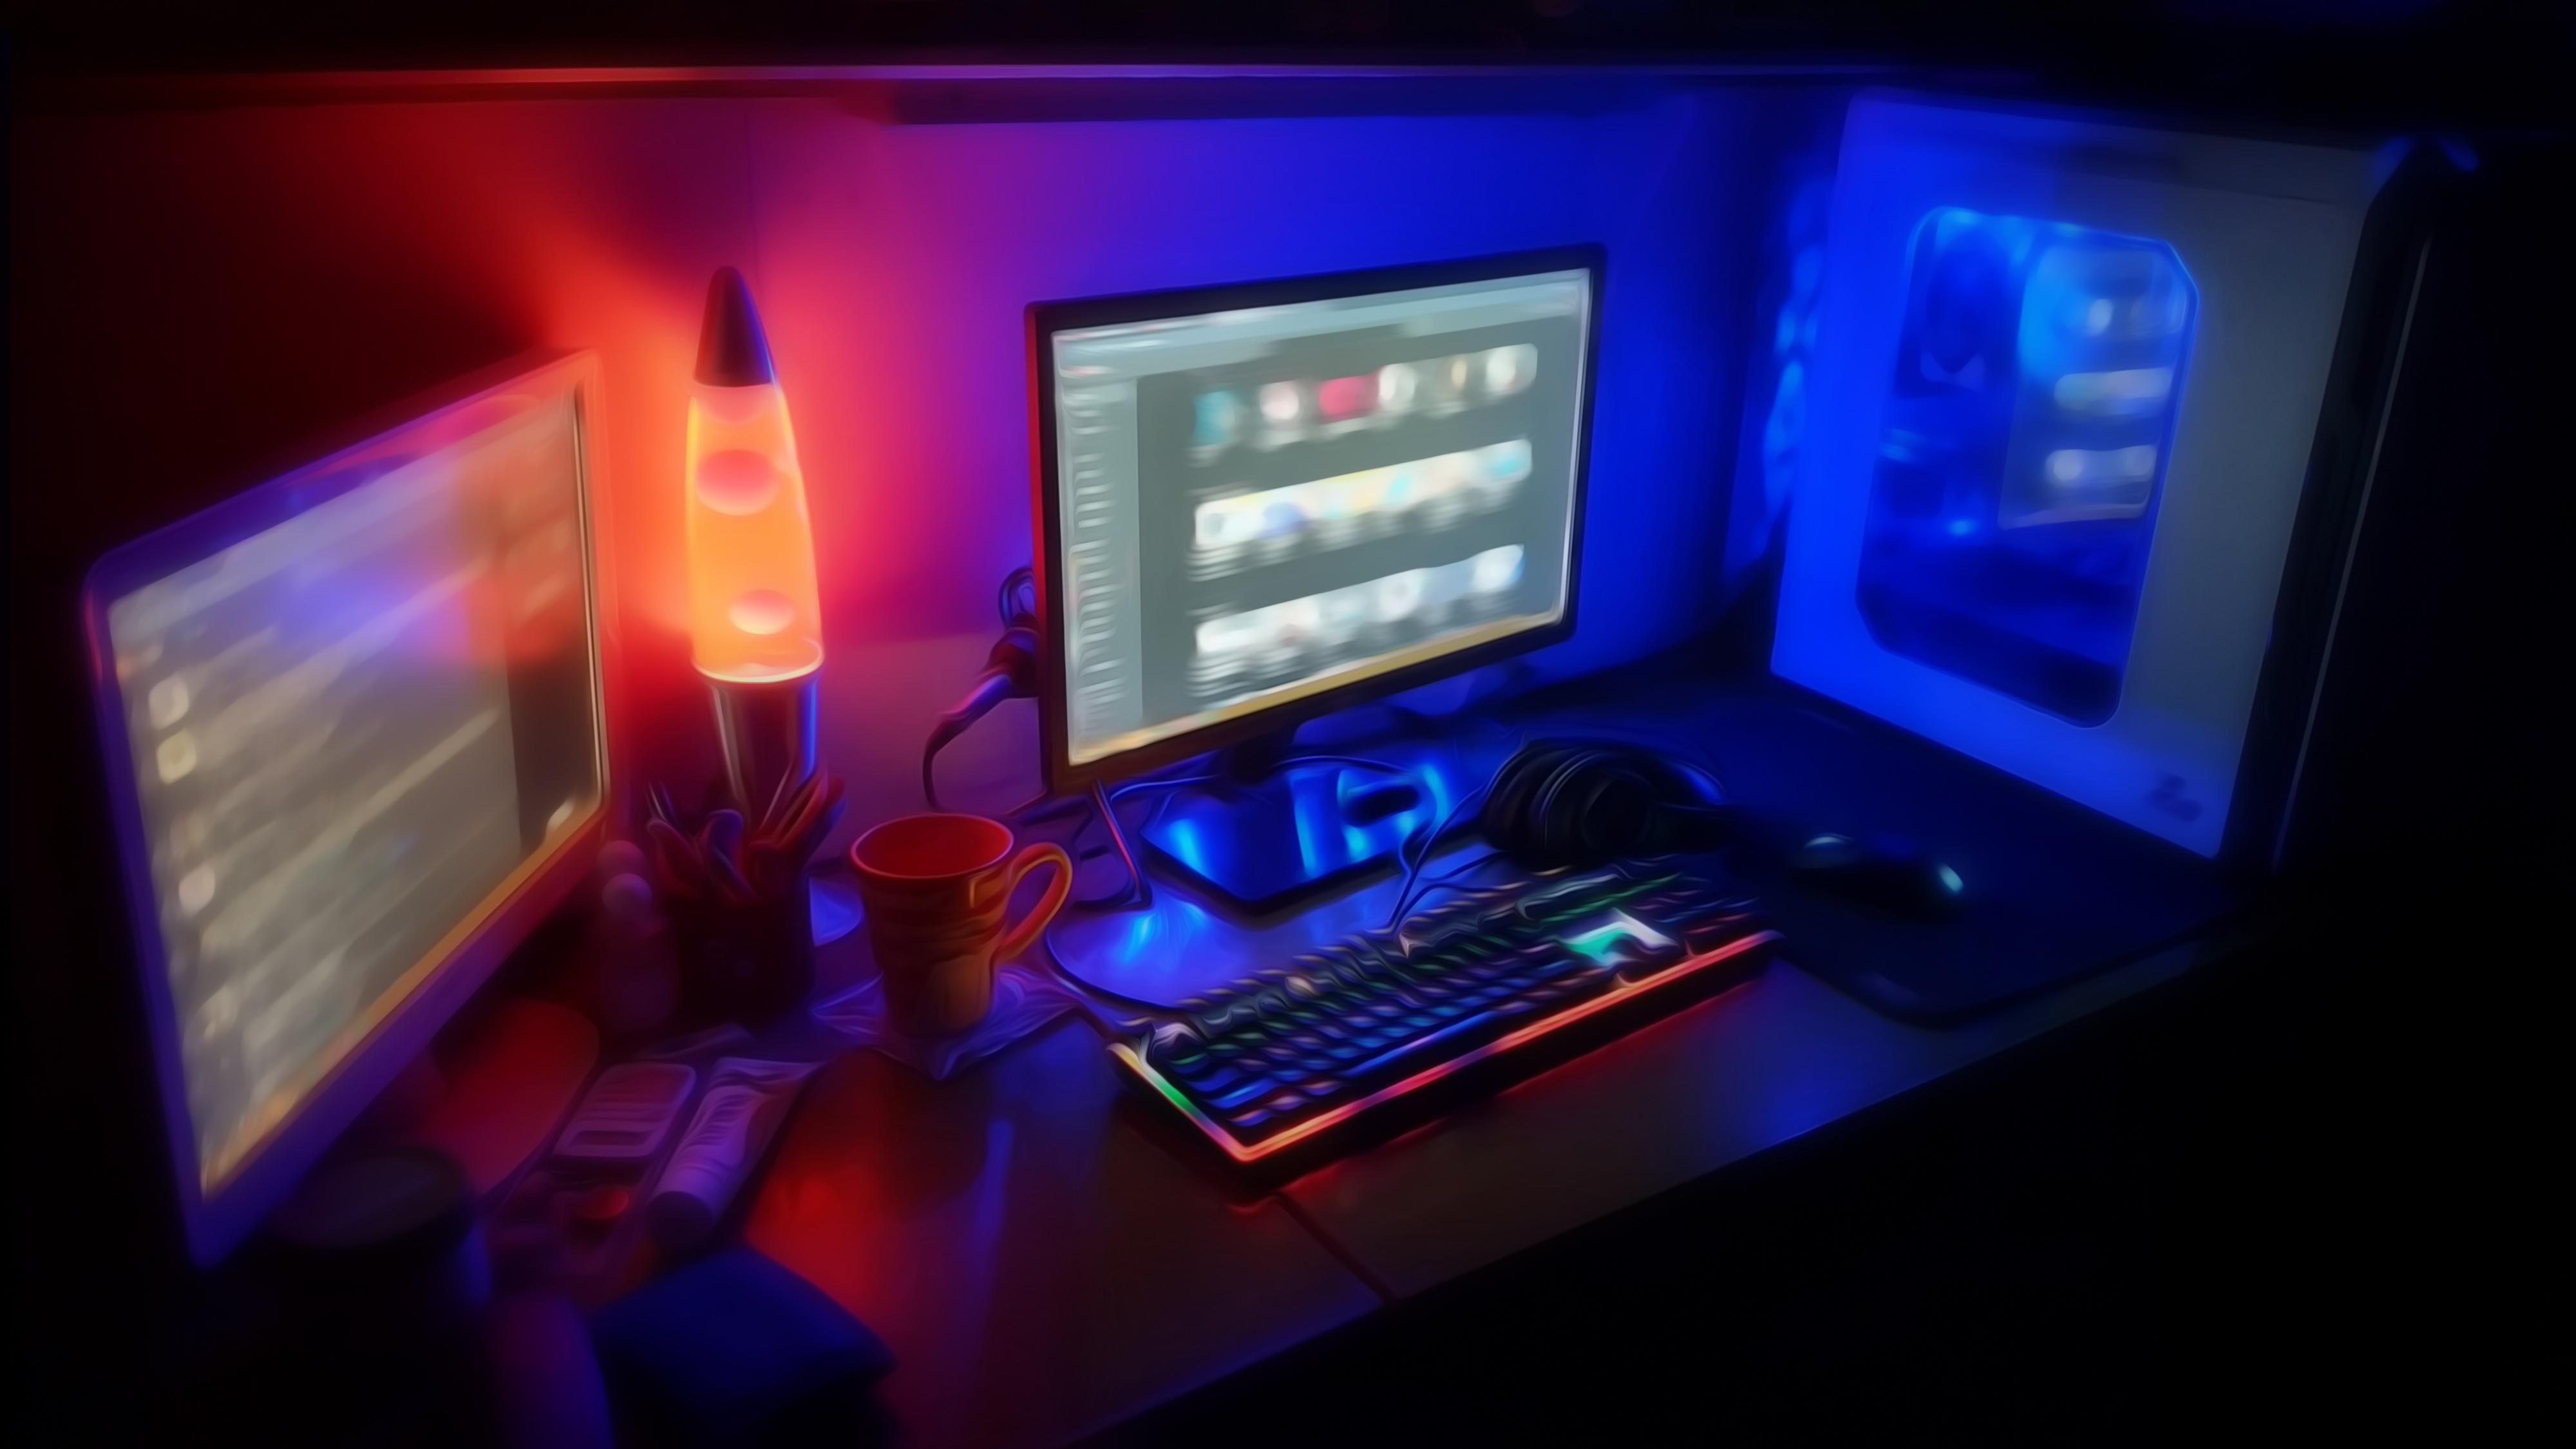 Computer Desk 4k Wallpaper Computer Computer Wallpaper Pc Desk